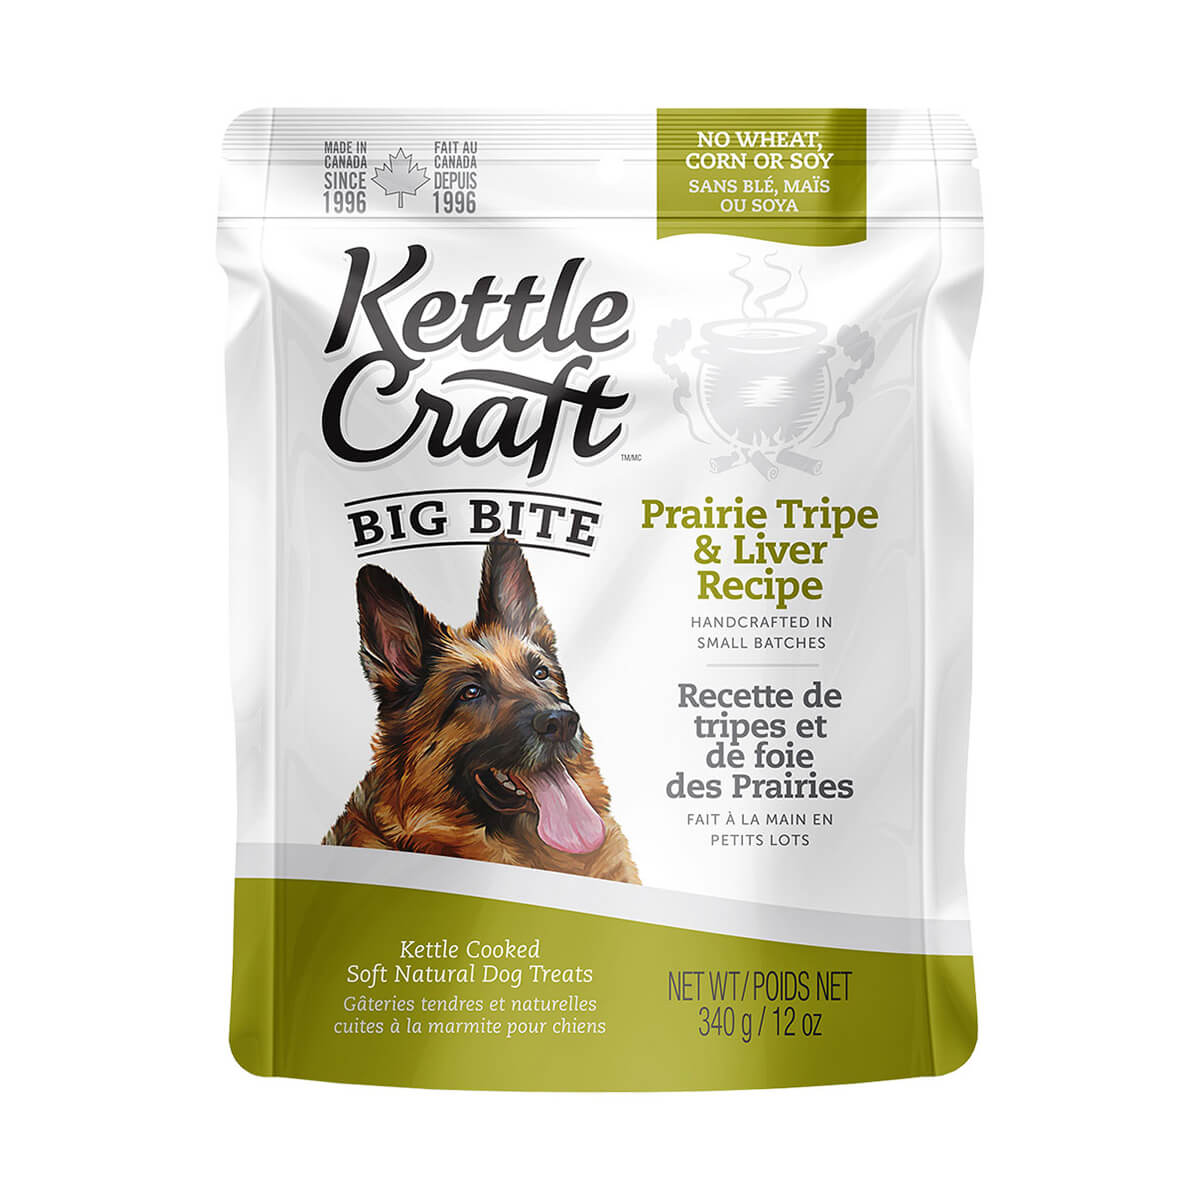 Kettle Craft Large Liver Dog Treats - 340 g